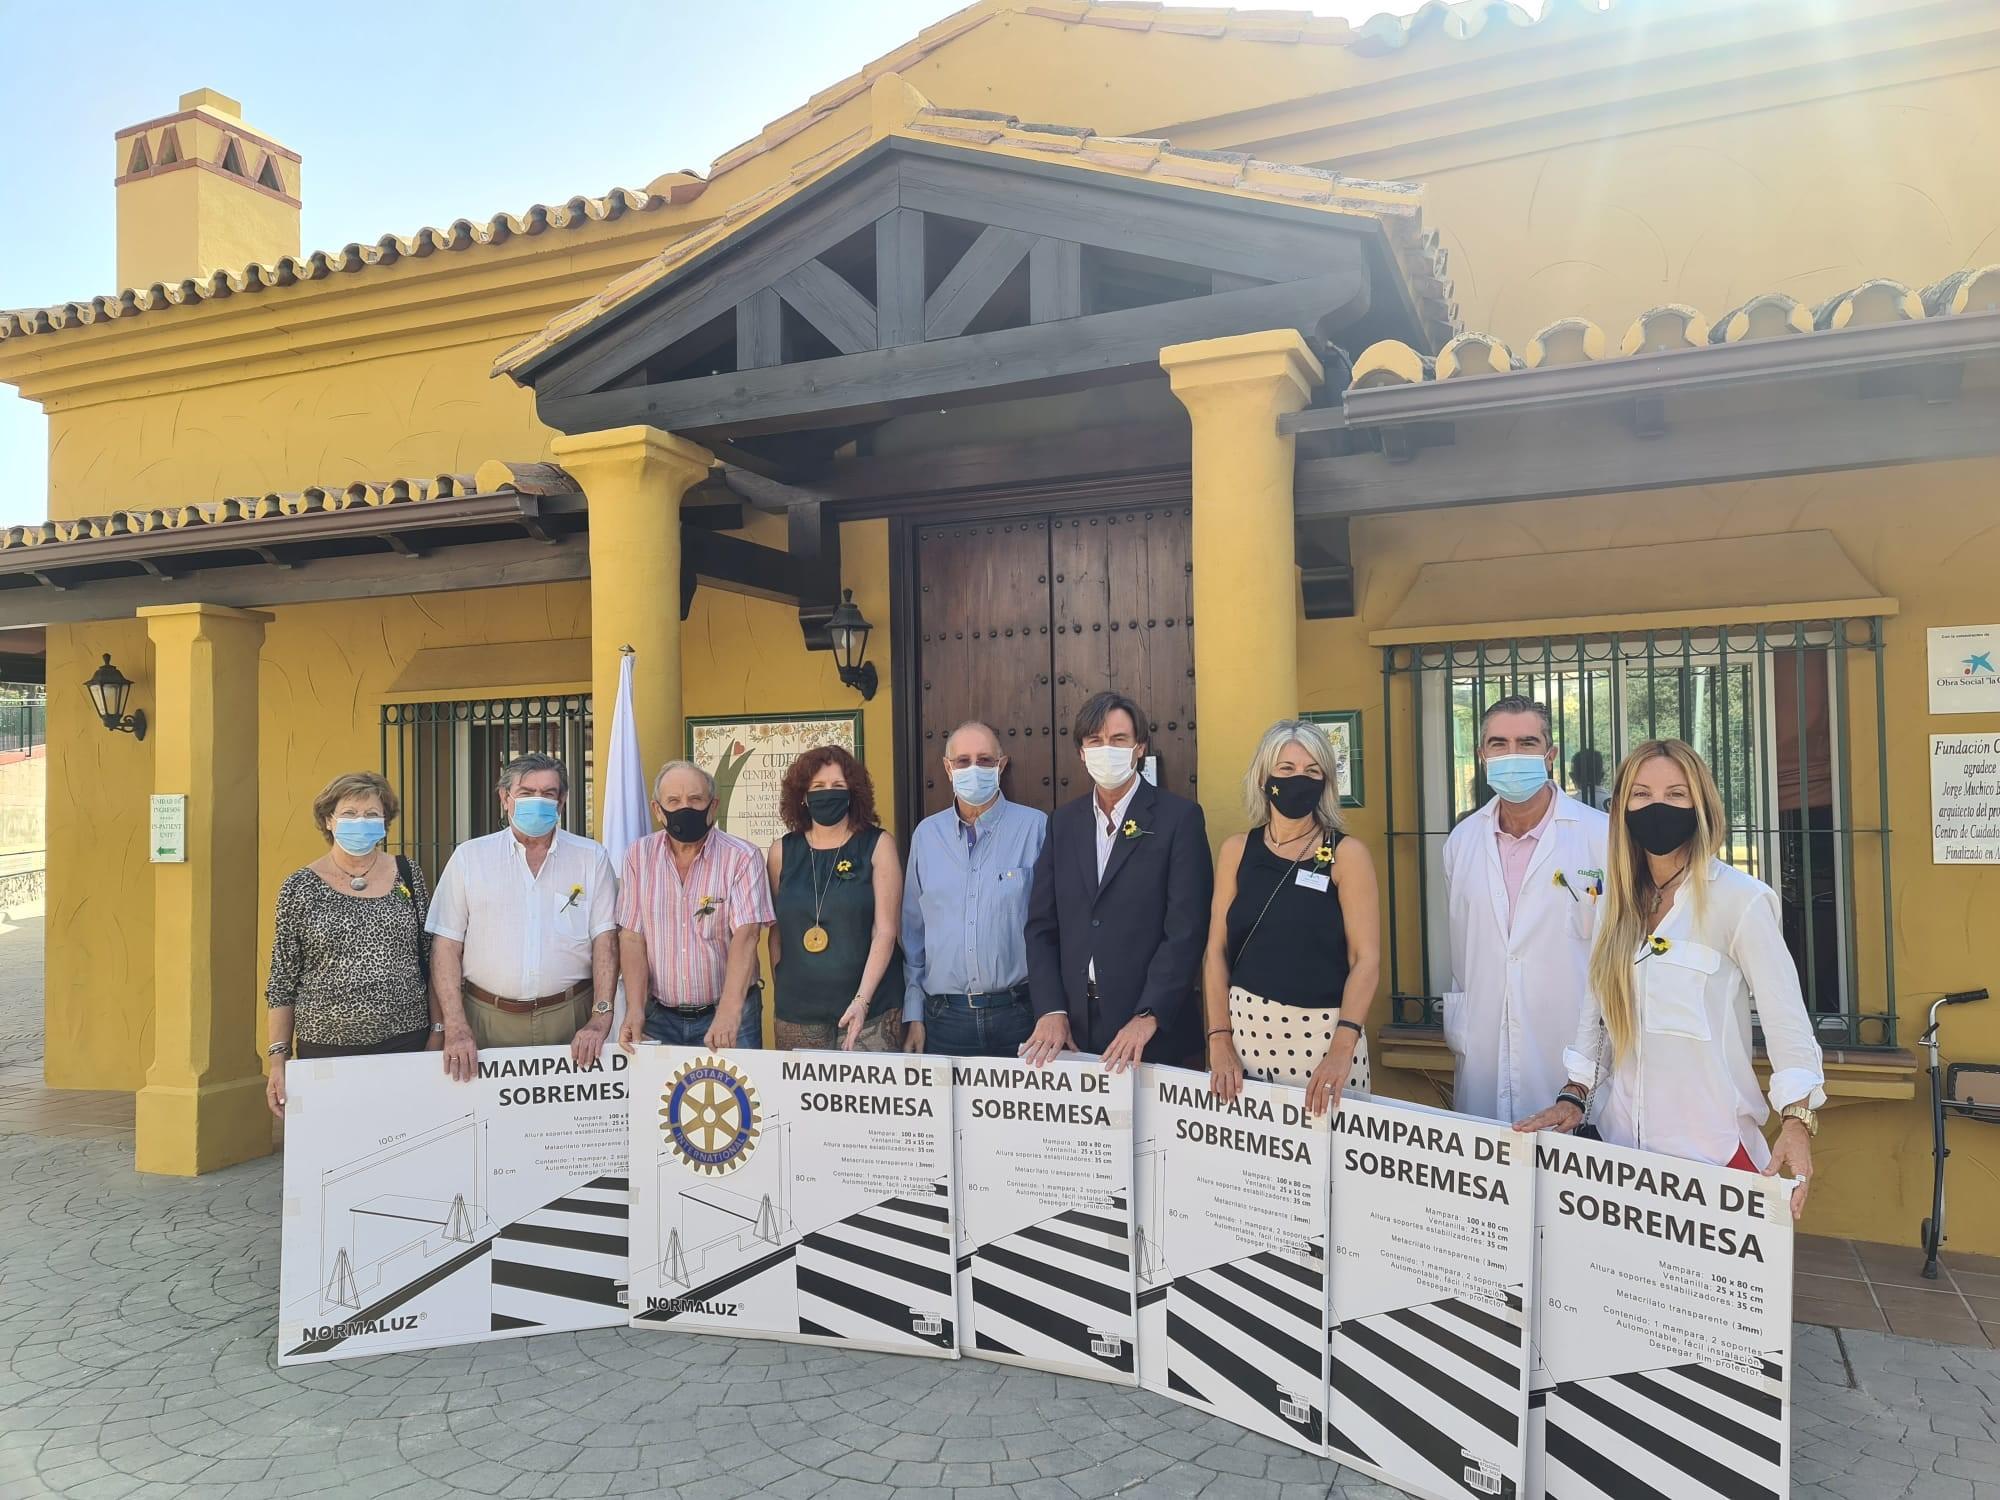 Donation from Rotary Club from Benalmádena-Torremolinos